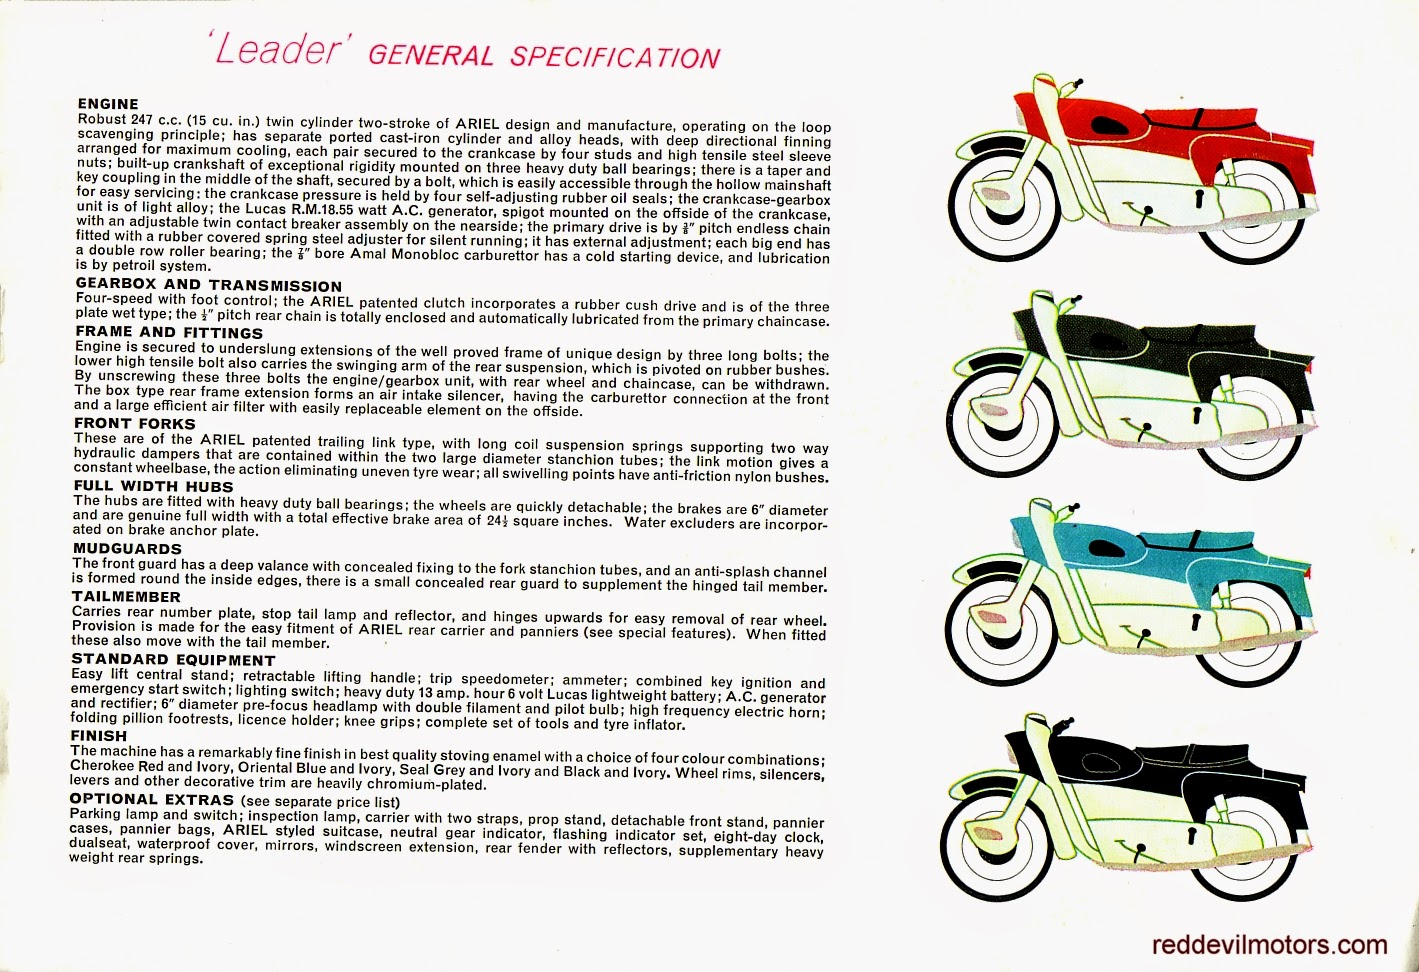 Ariel Arrow and Leader brochure page 4